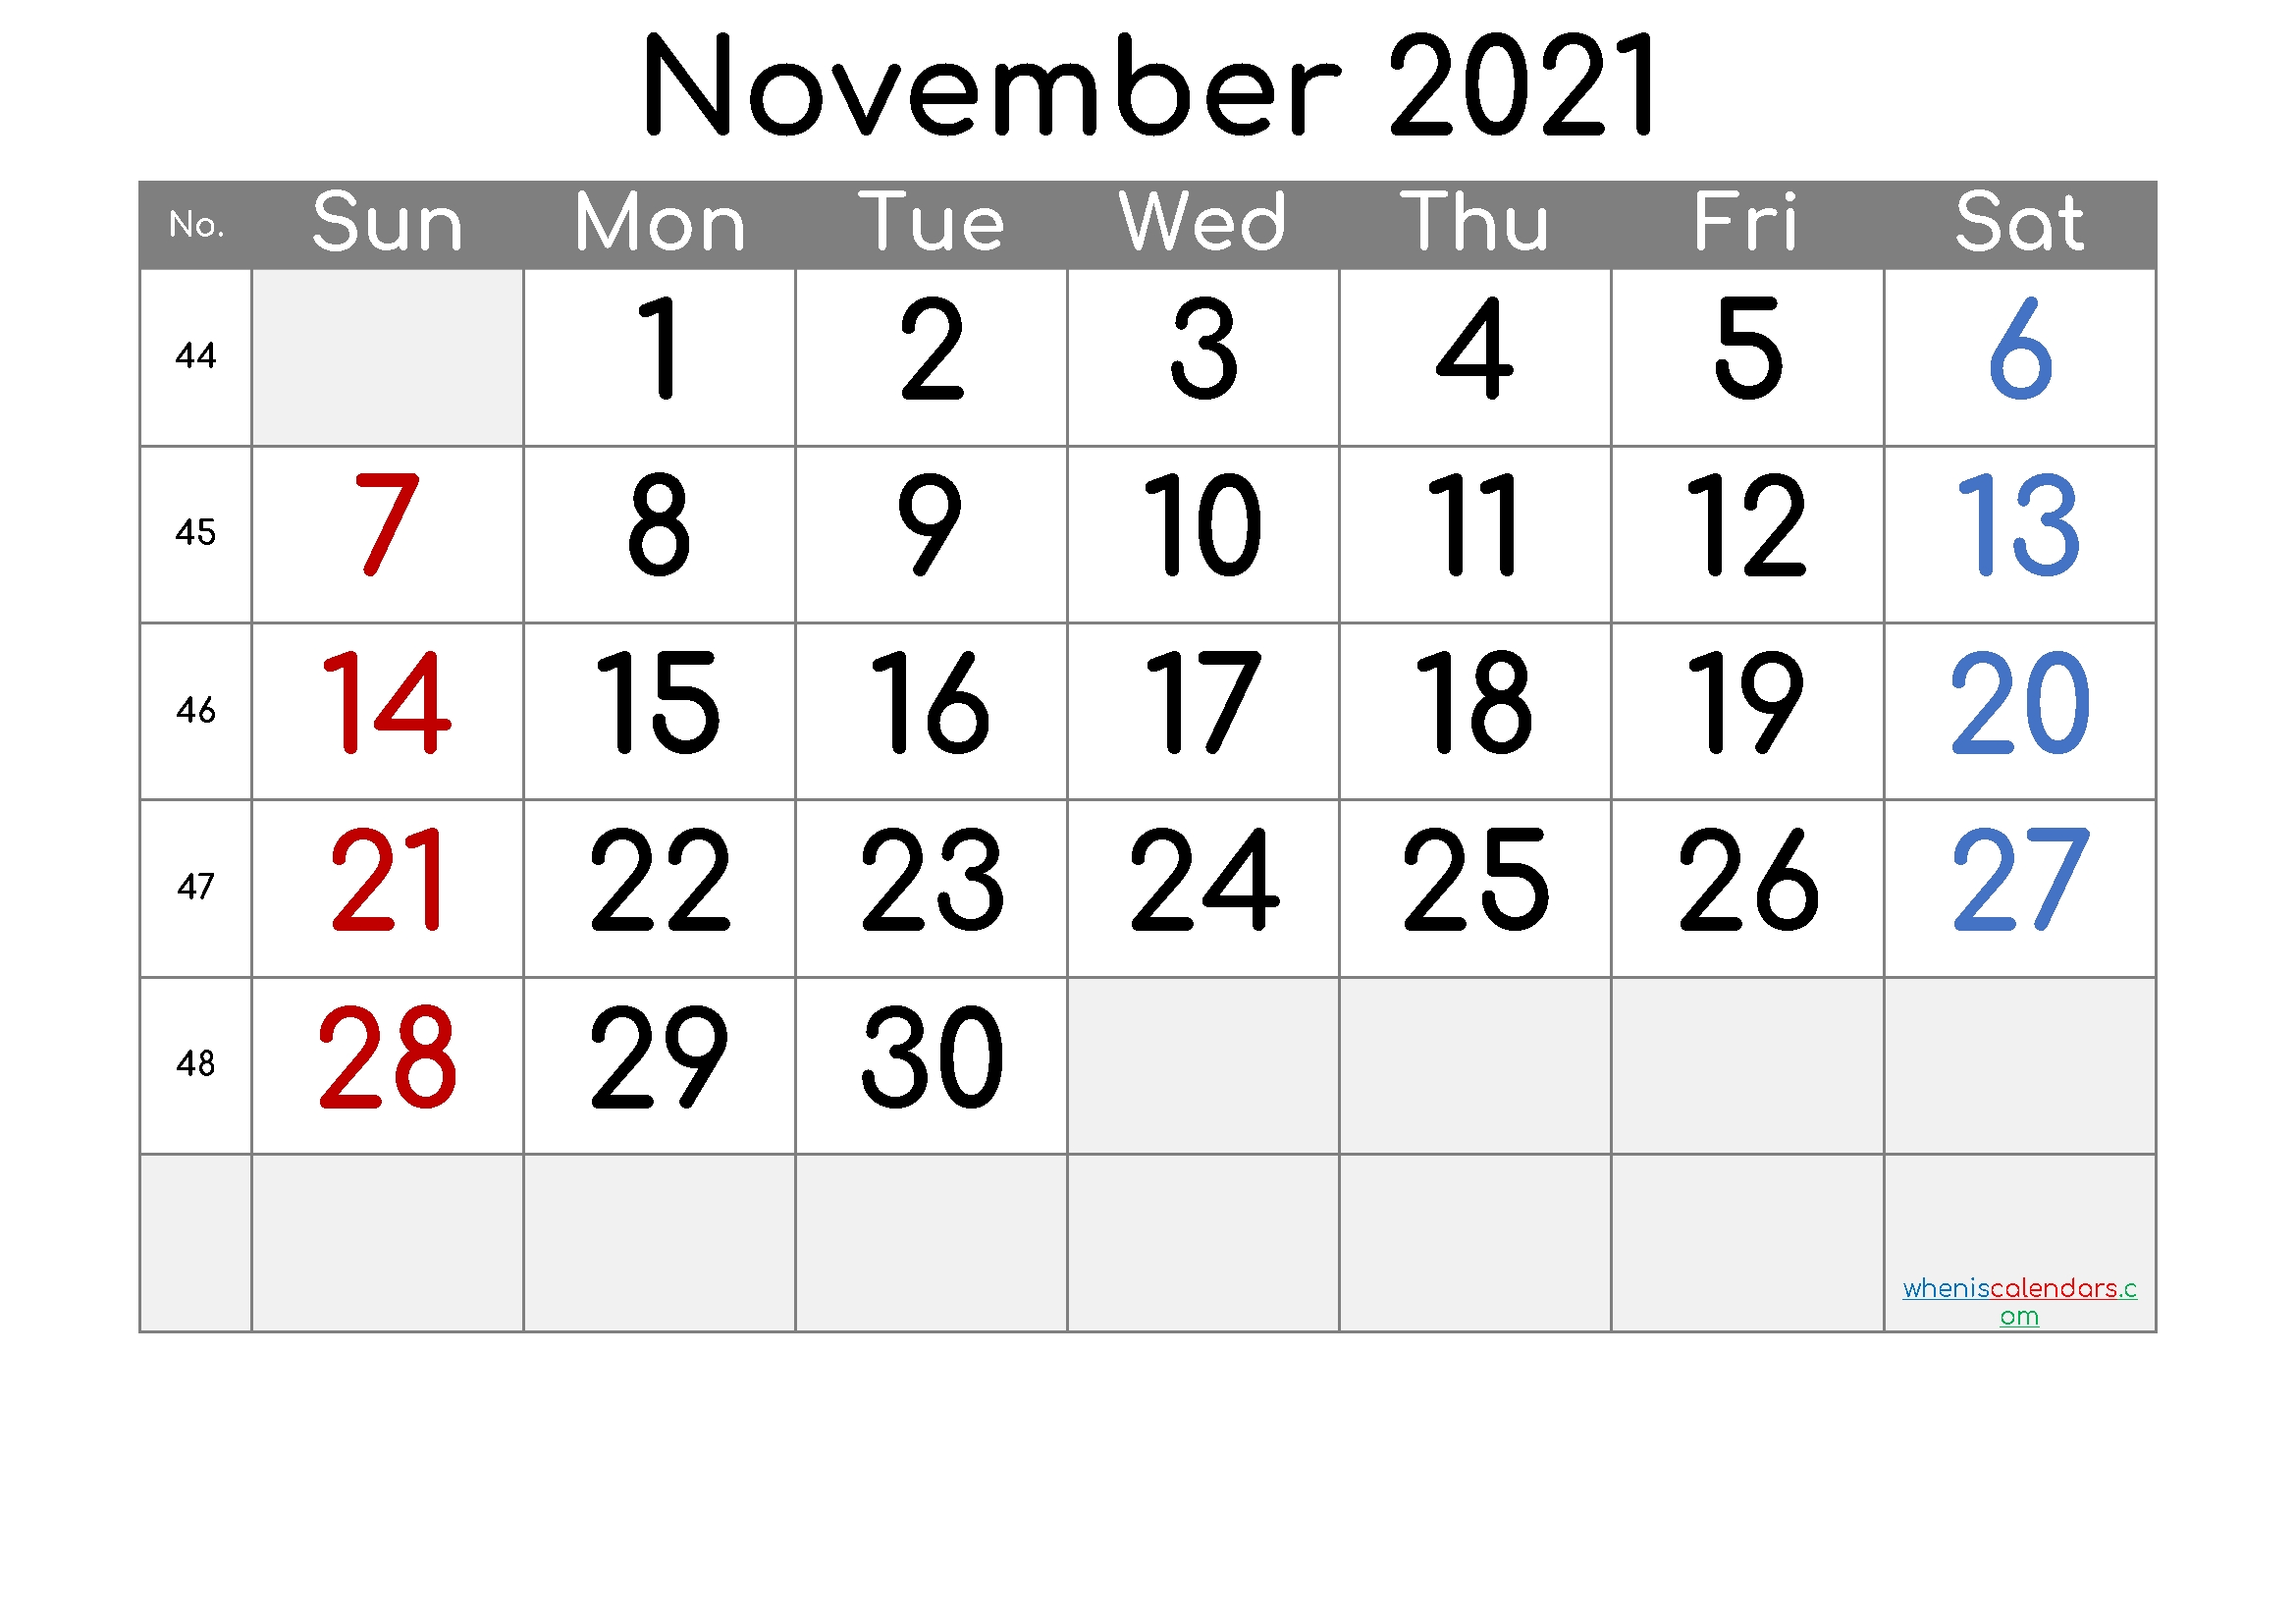 November 2021 Printable Calendar - 6 Templates | Free Printable 2020 Calendar With Holidays Free Printable November 2021 Calendar With Holidays